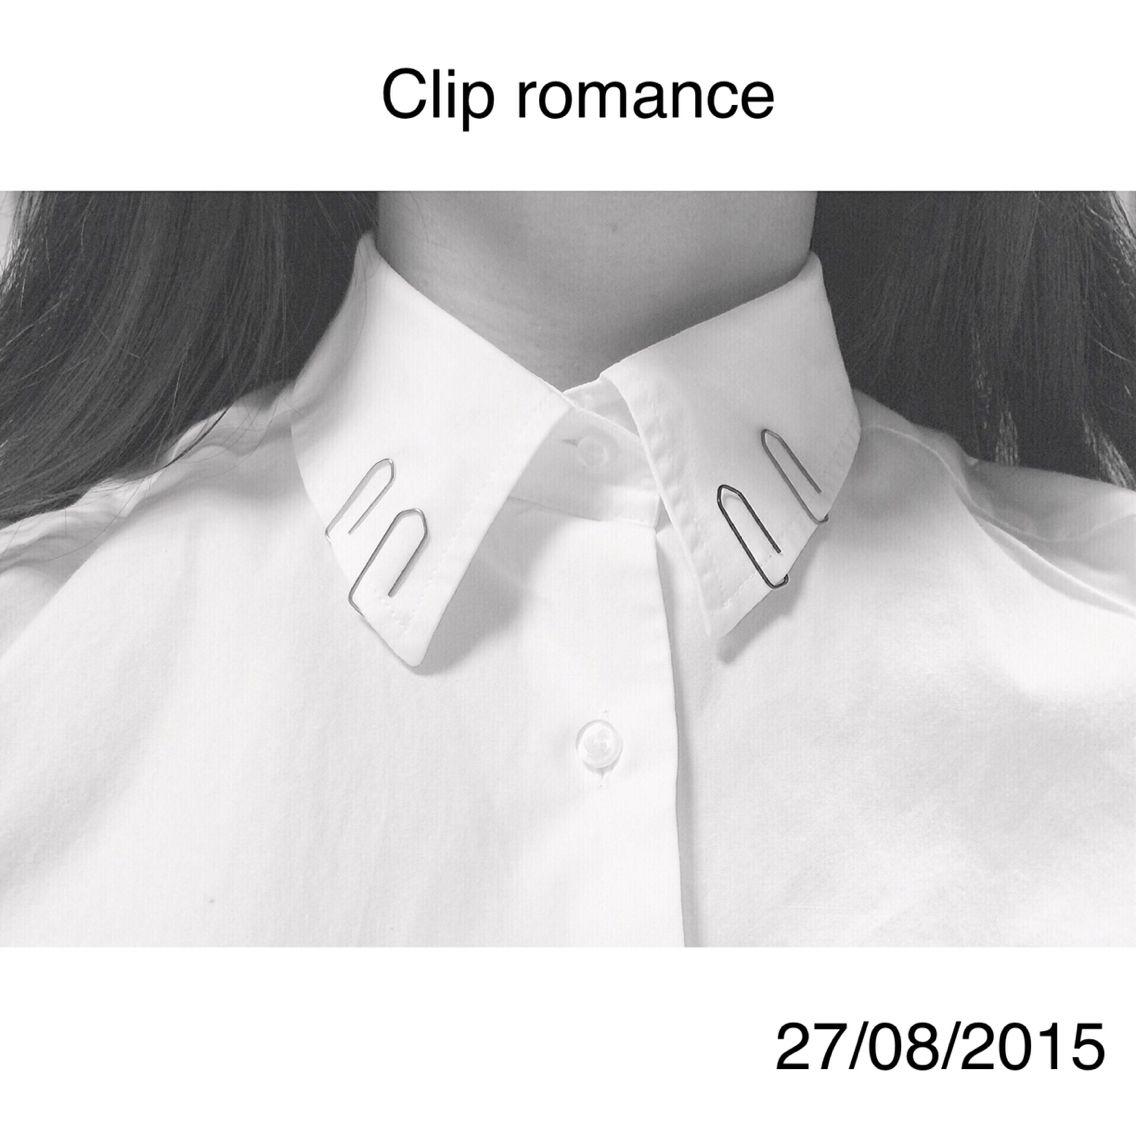 Clip romance